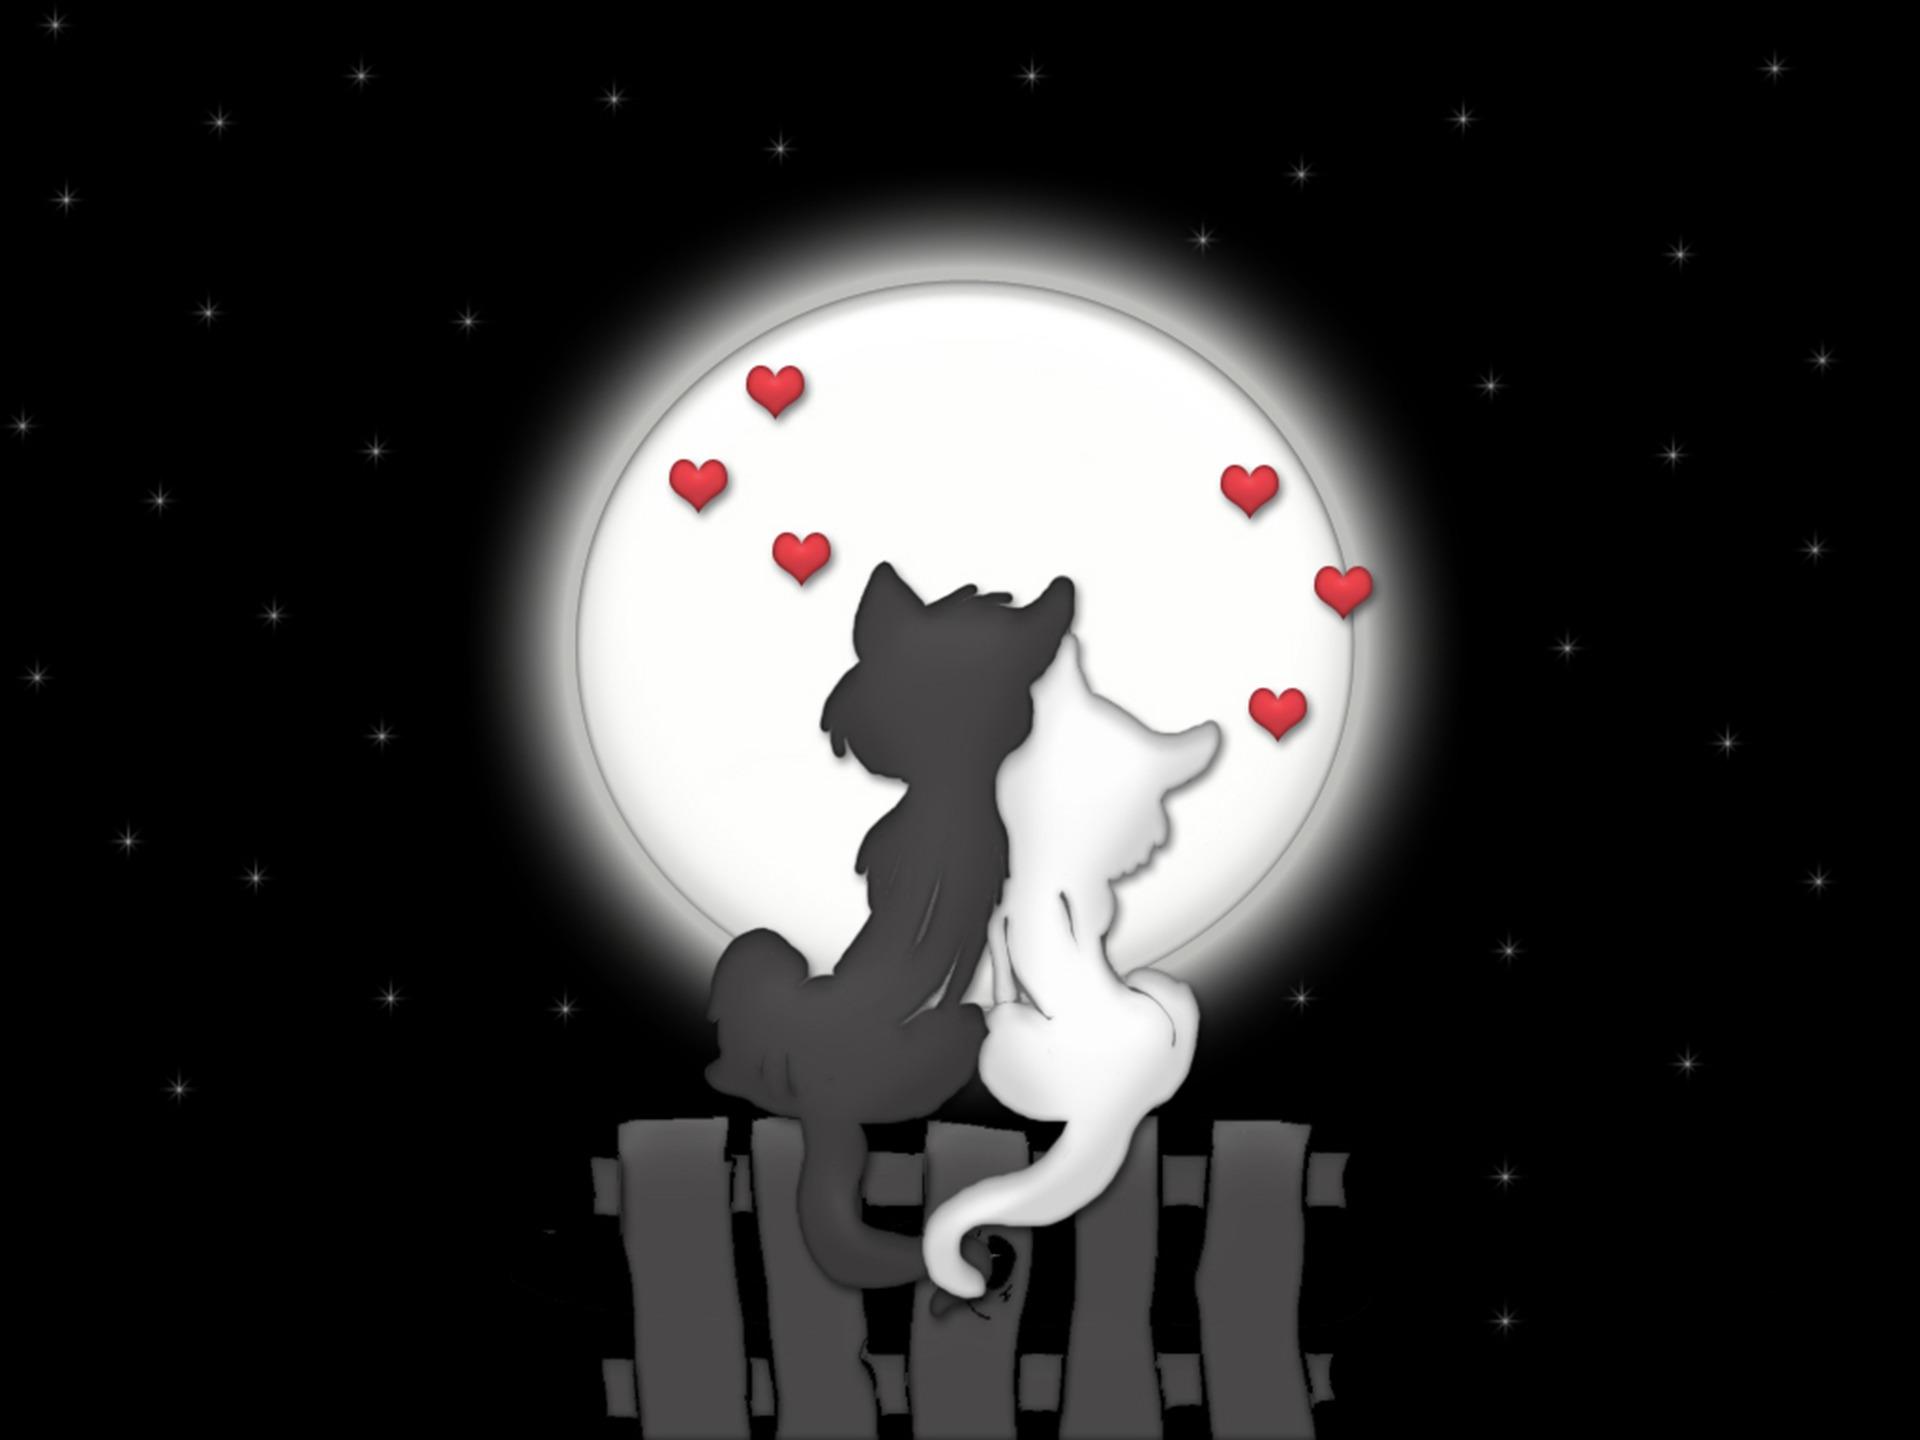 собак картинки с котиками про любовь Мунасыпова Андрее